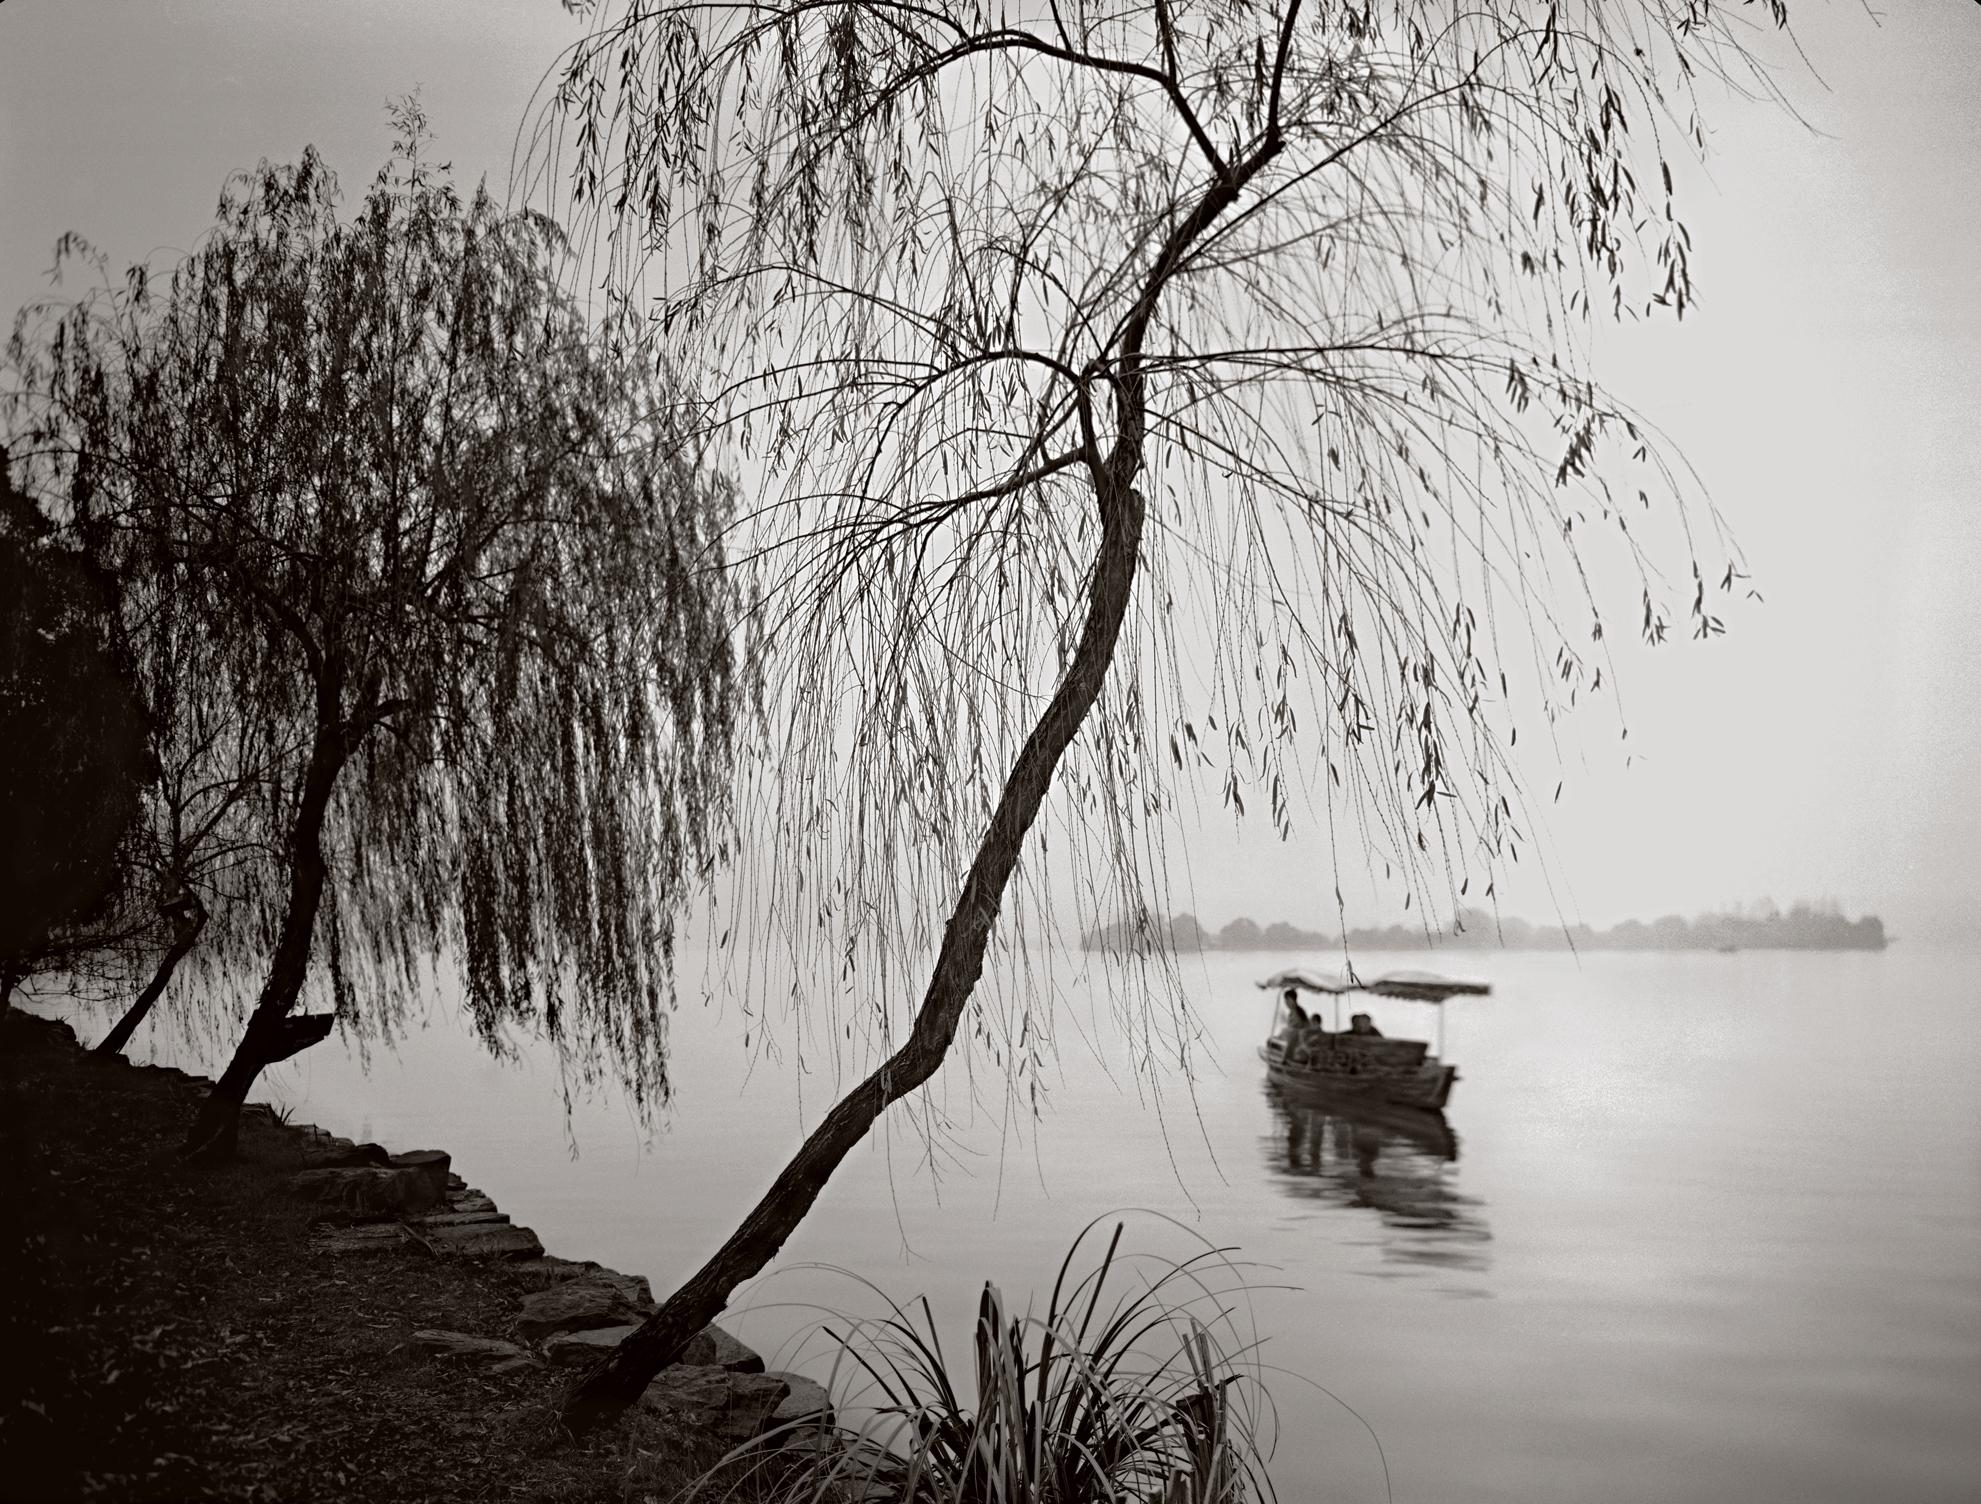 Returning boat.FINAL*****.jpg